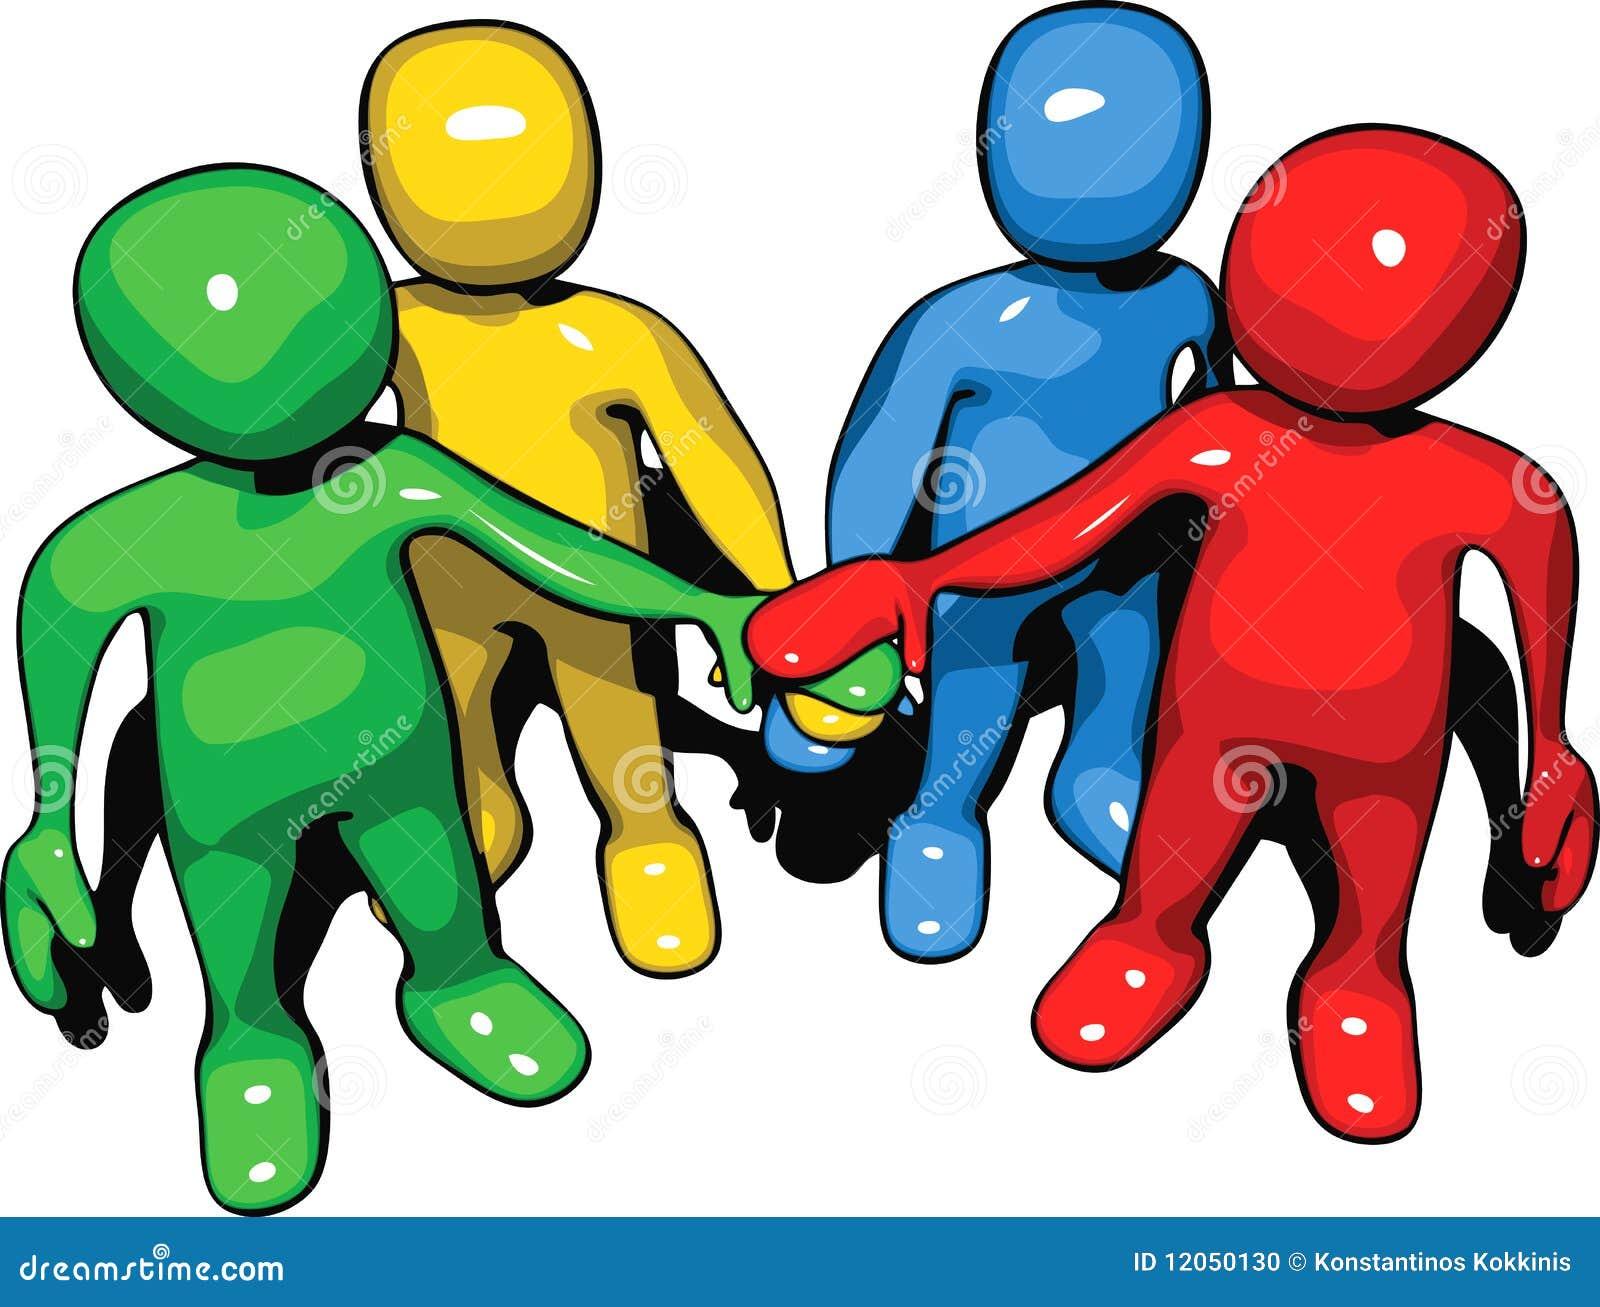 Teamwork Stock Photo - Image: 12050130